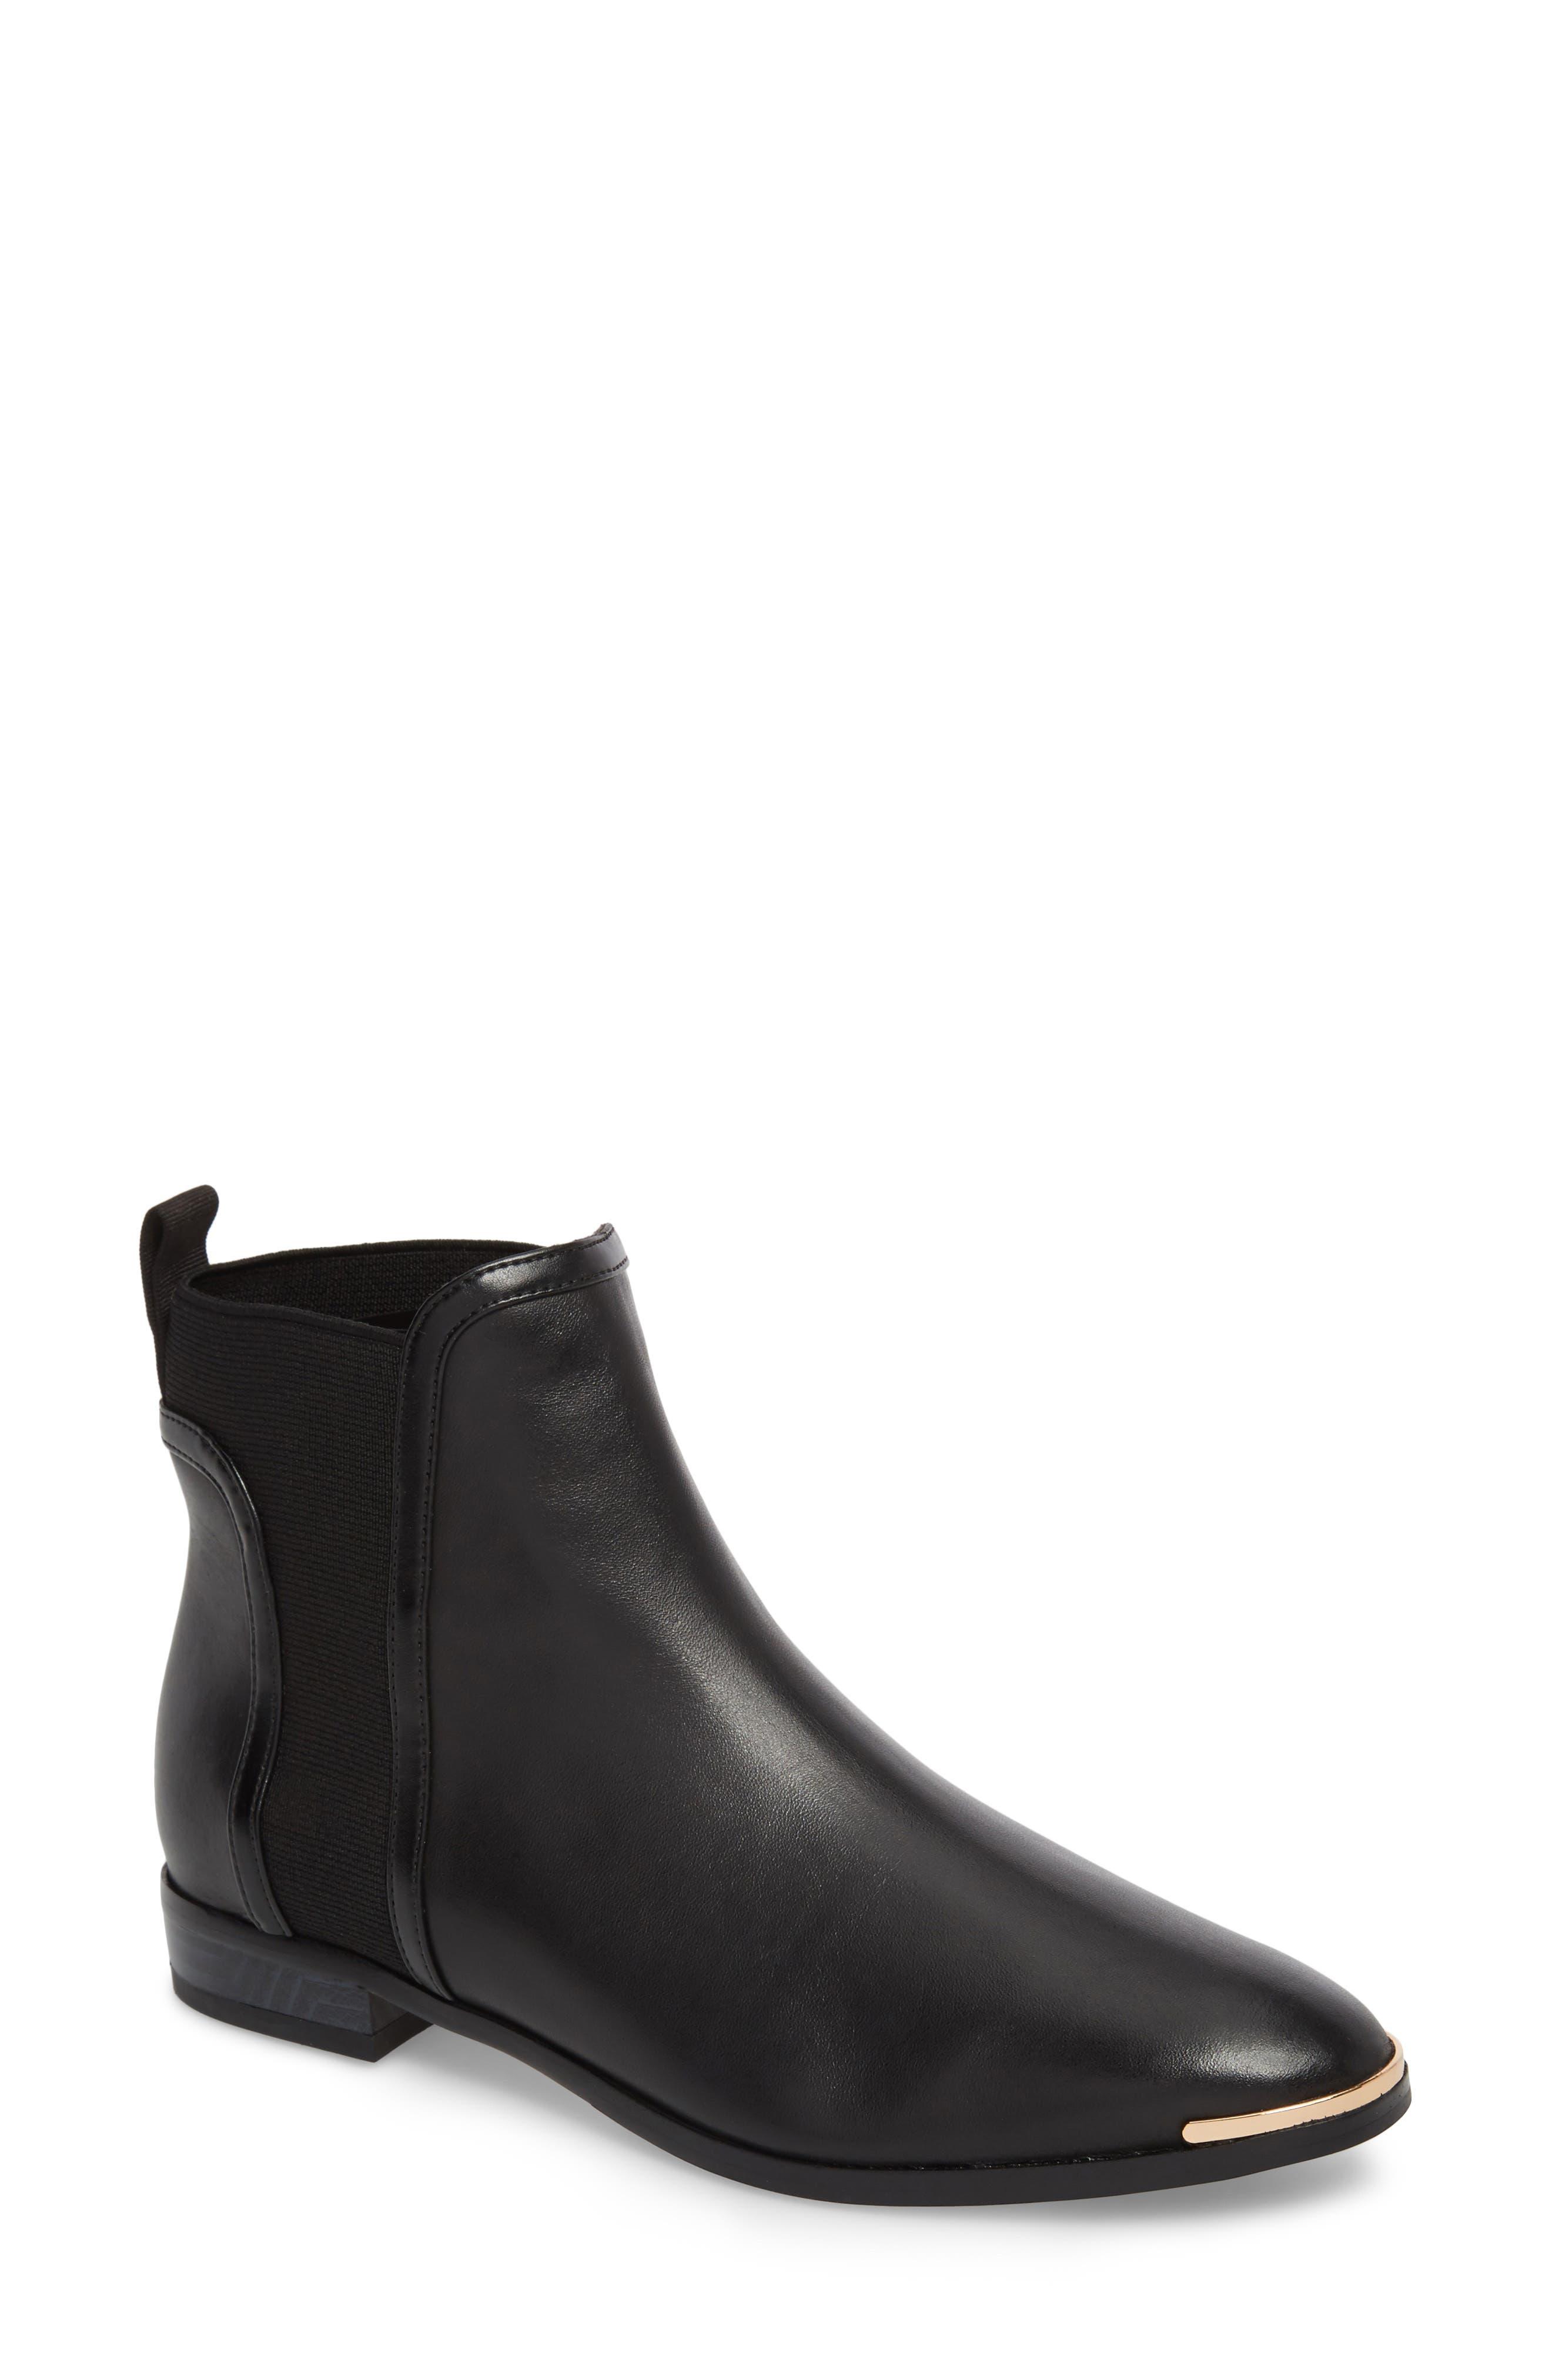 Kerei Chelsea Boot,                         Main,                         color, Black Leather